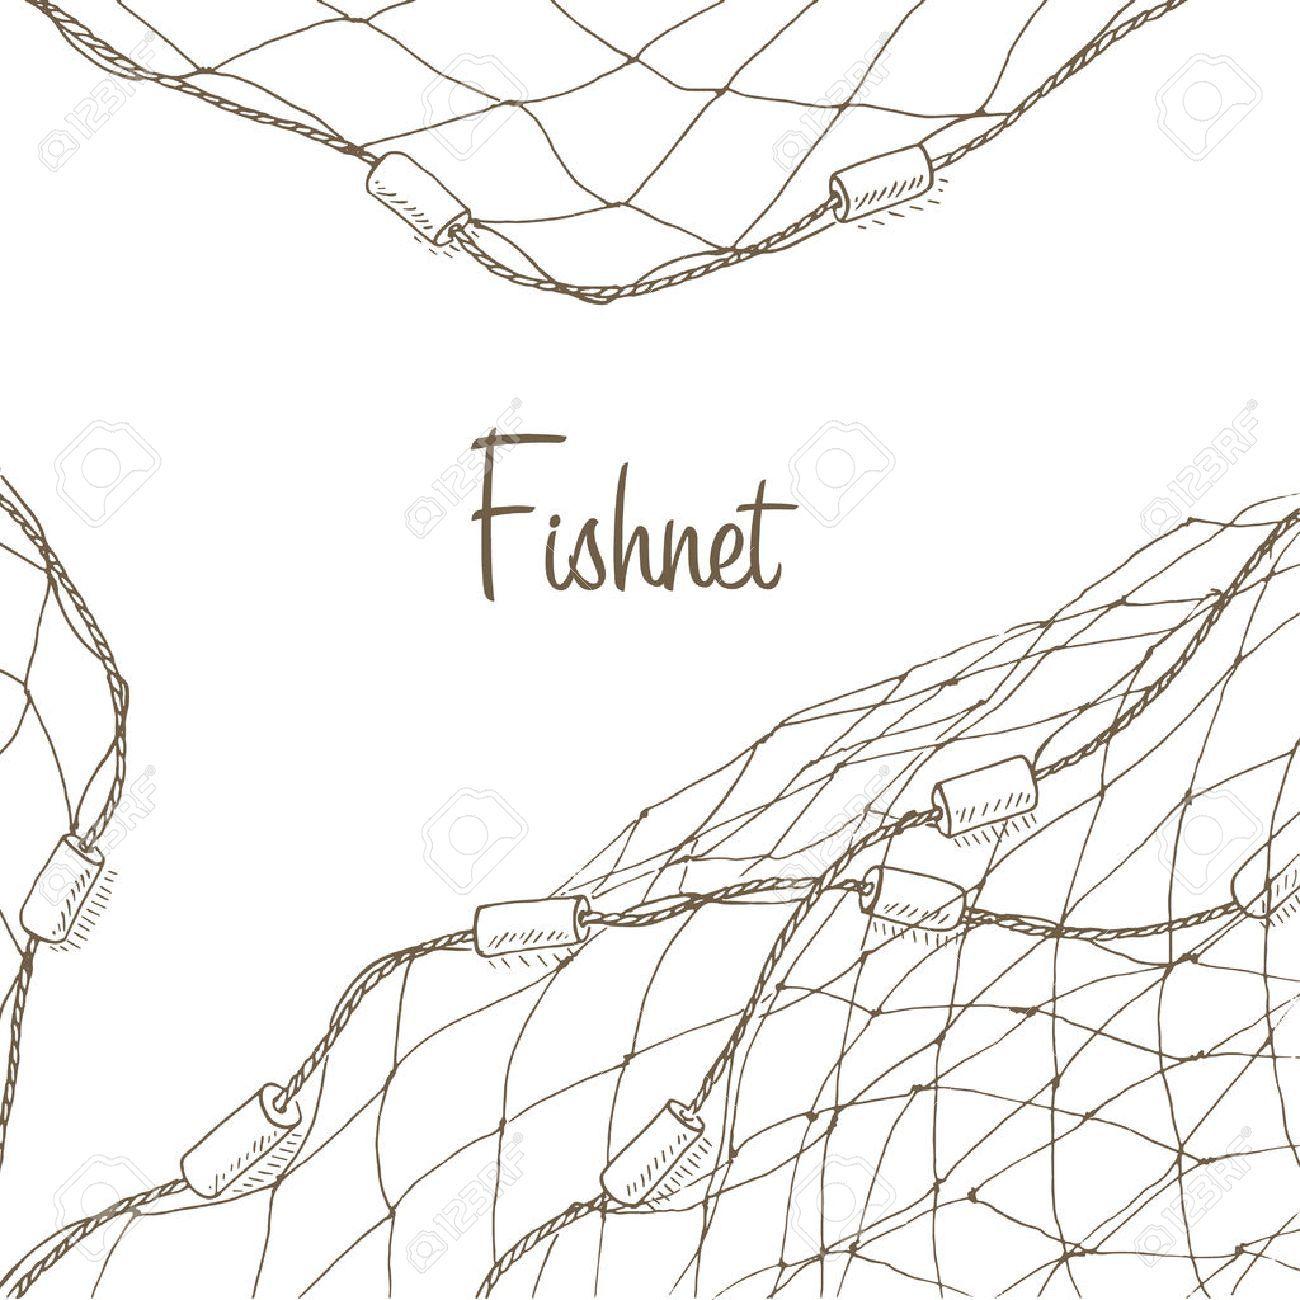 Image Result For Fishing Net Illustration Graphic Tshirt Design Endangered Species Art Hand Drawn Vector Illustrations